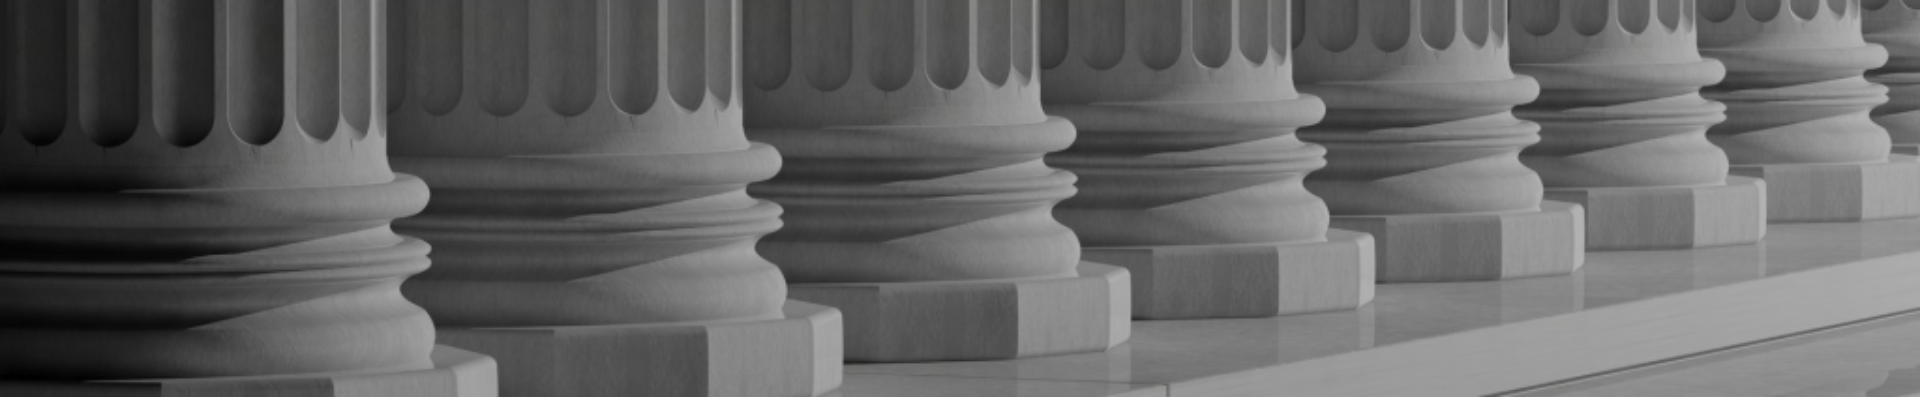 Sikorski Law Firm, PLLC